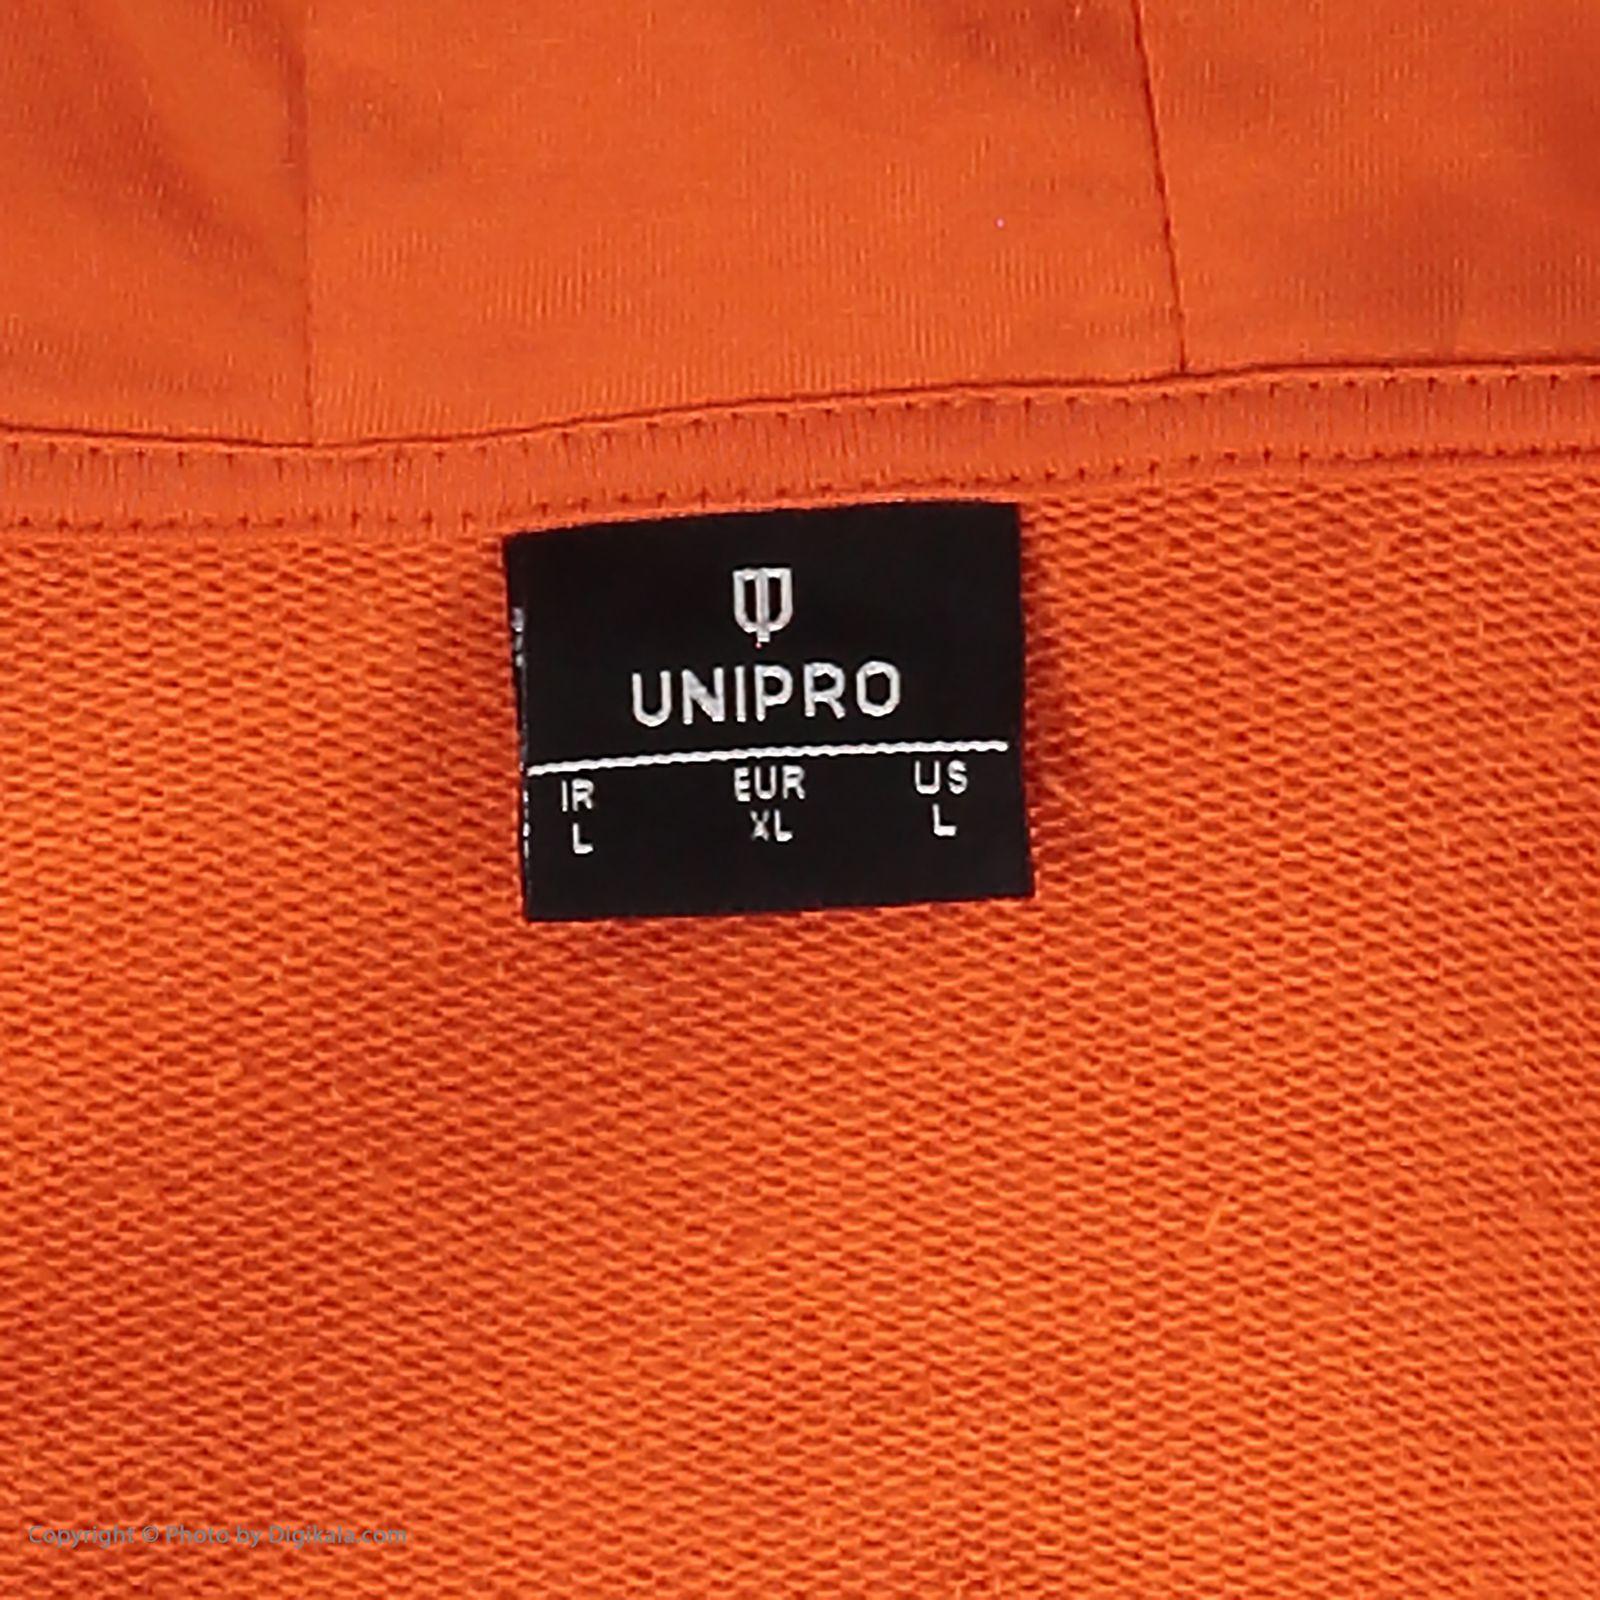 هودی مردانه یونی پرو مدل 914159309-30 -  - 6